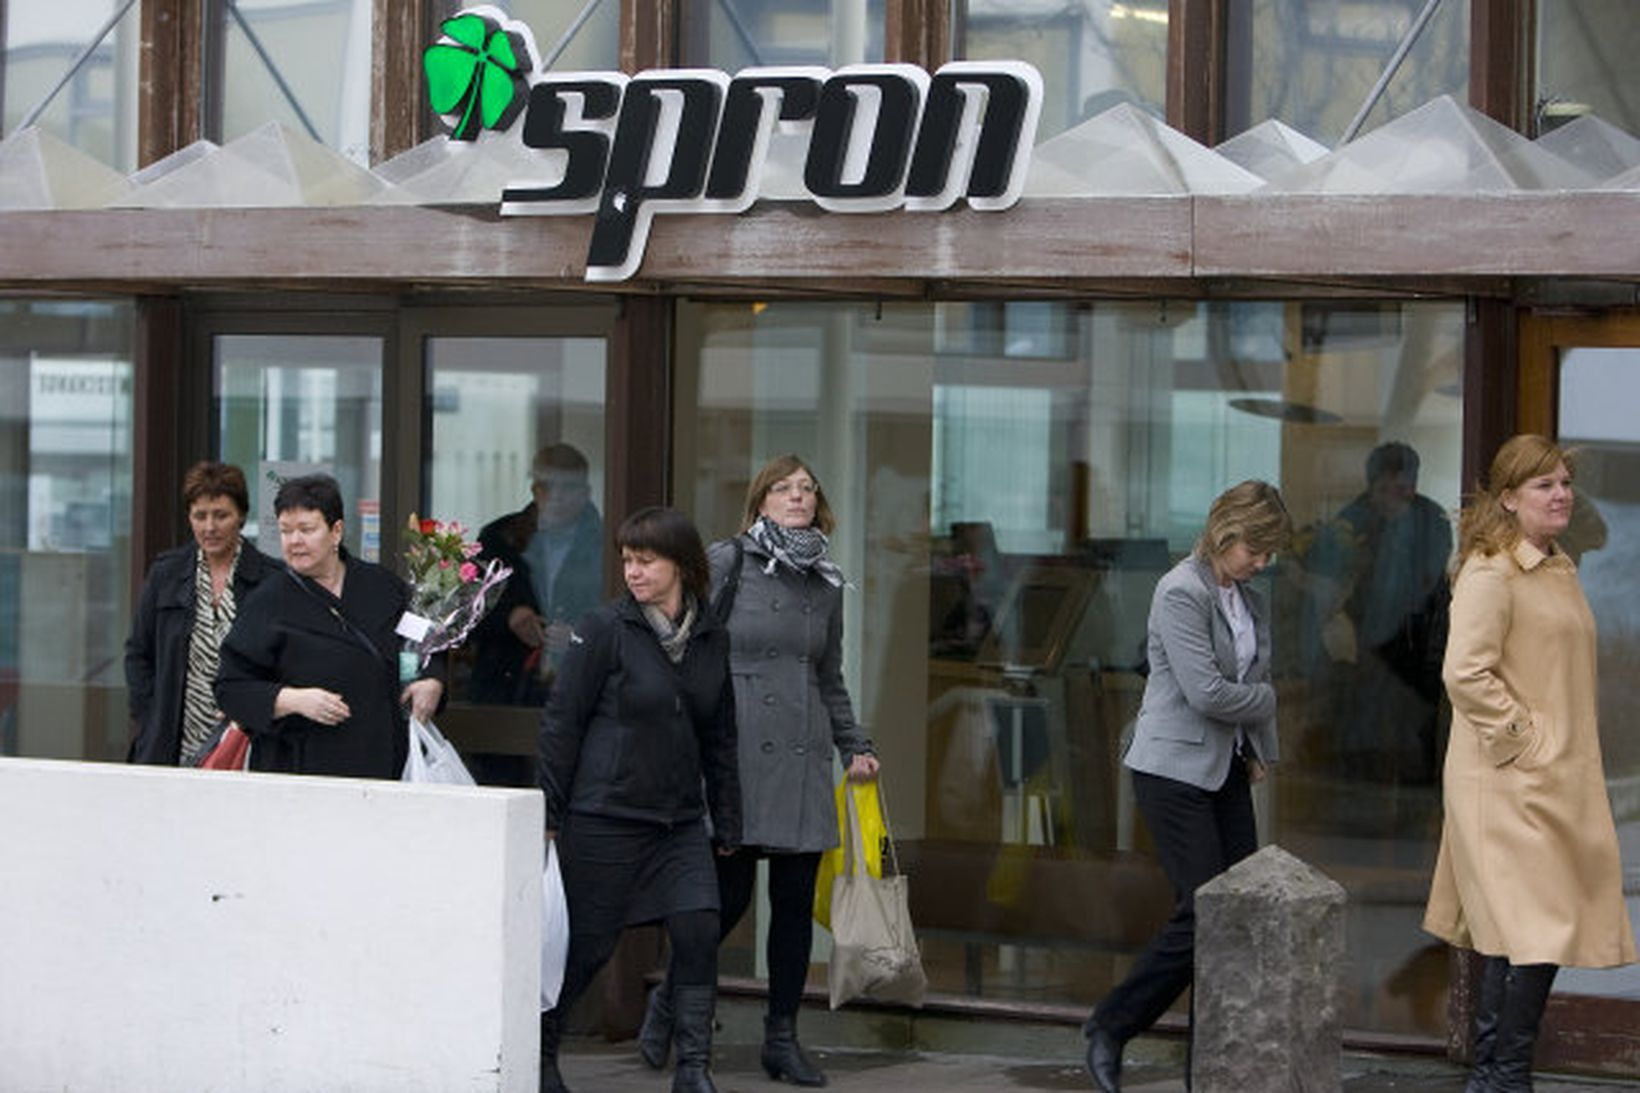 MP banki hefur keypt SPRON.